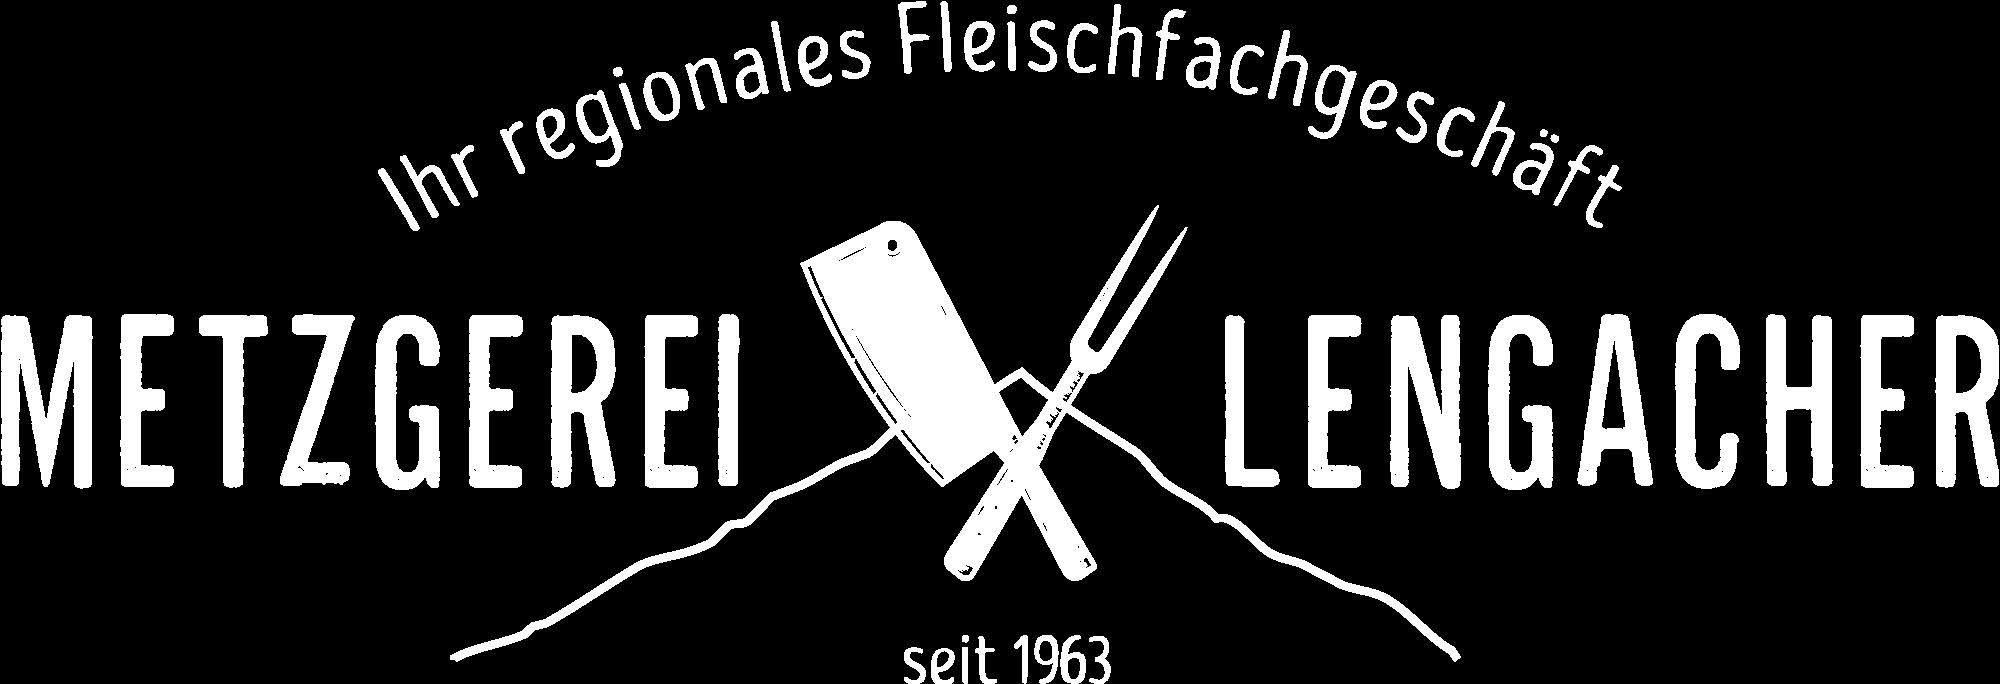 Metzgerei Lengacher